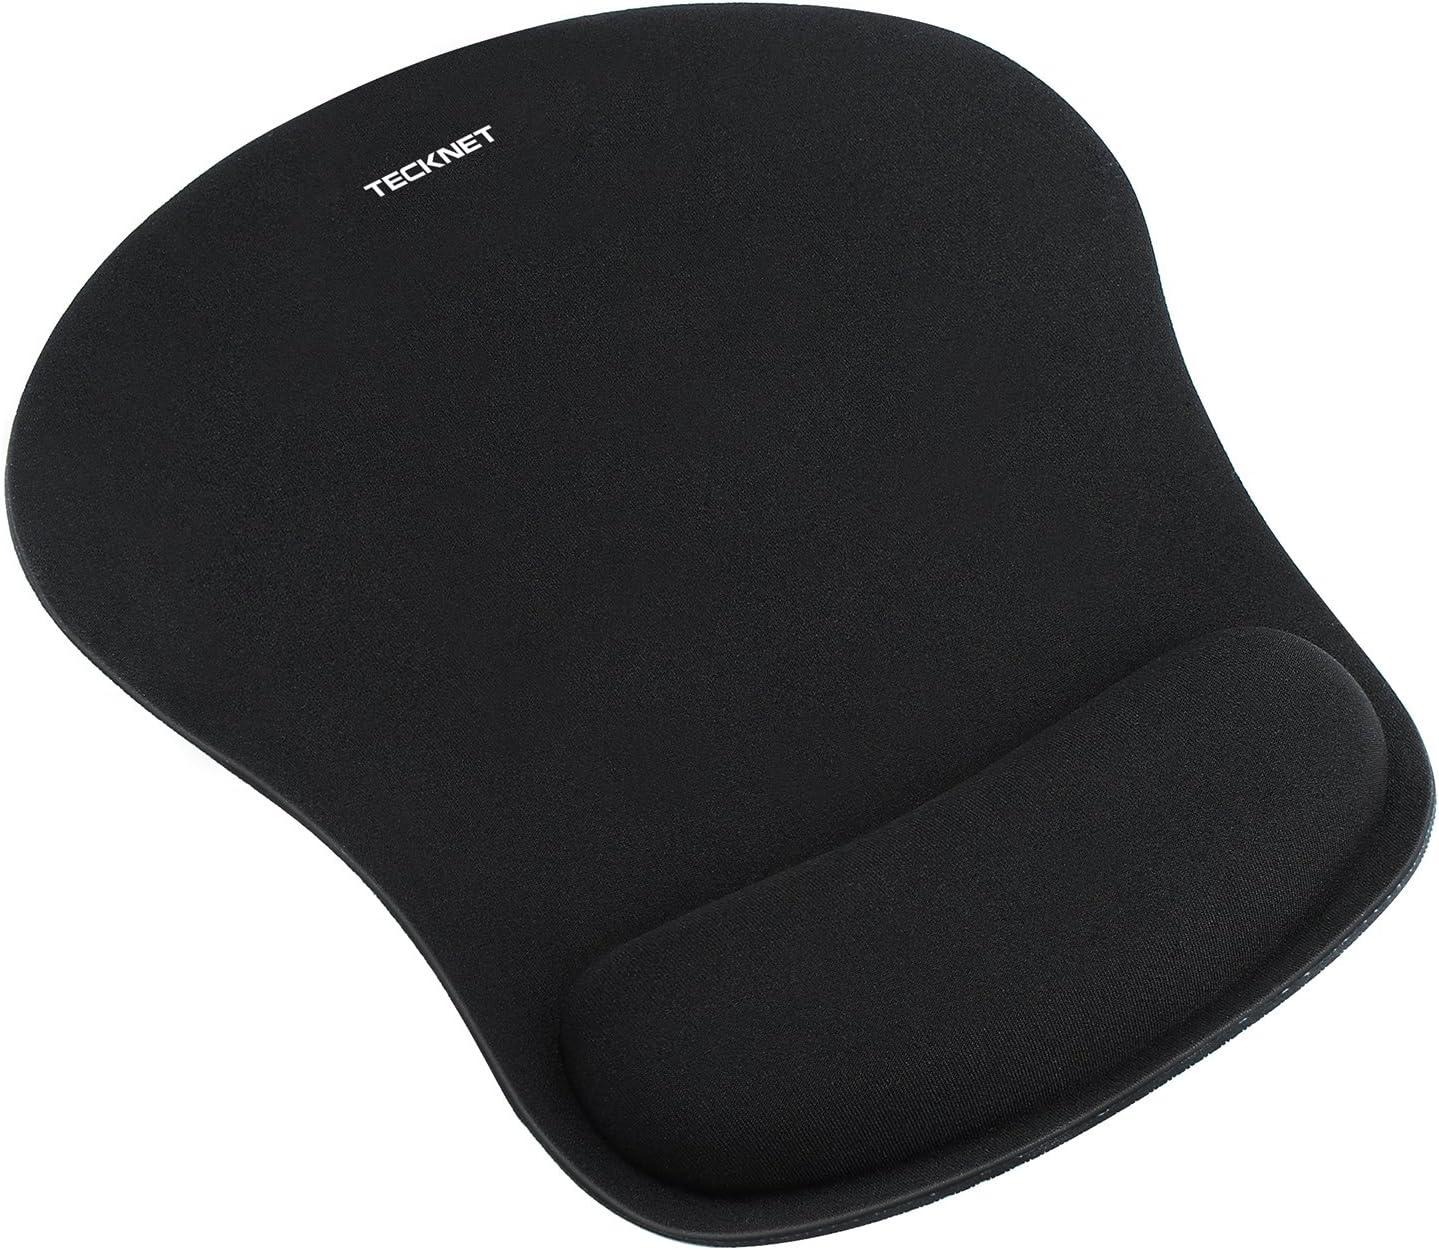 TeckNet Ergonomic Mouse Pad Wrist Rest